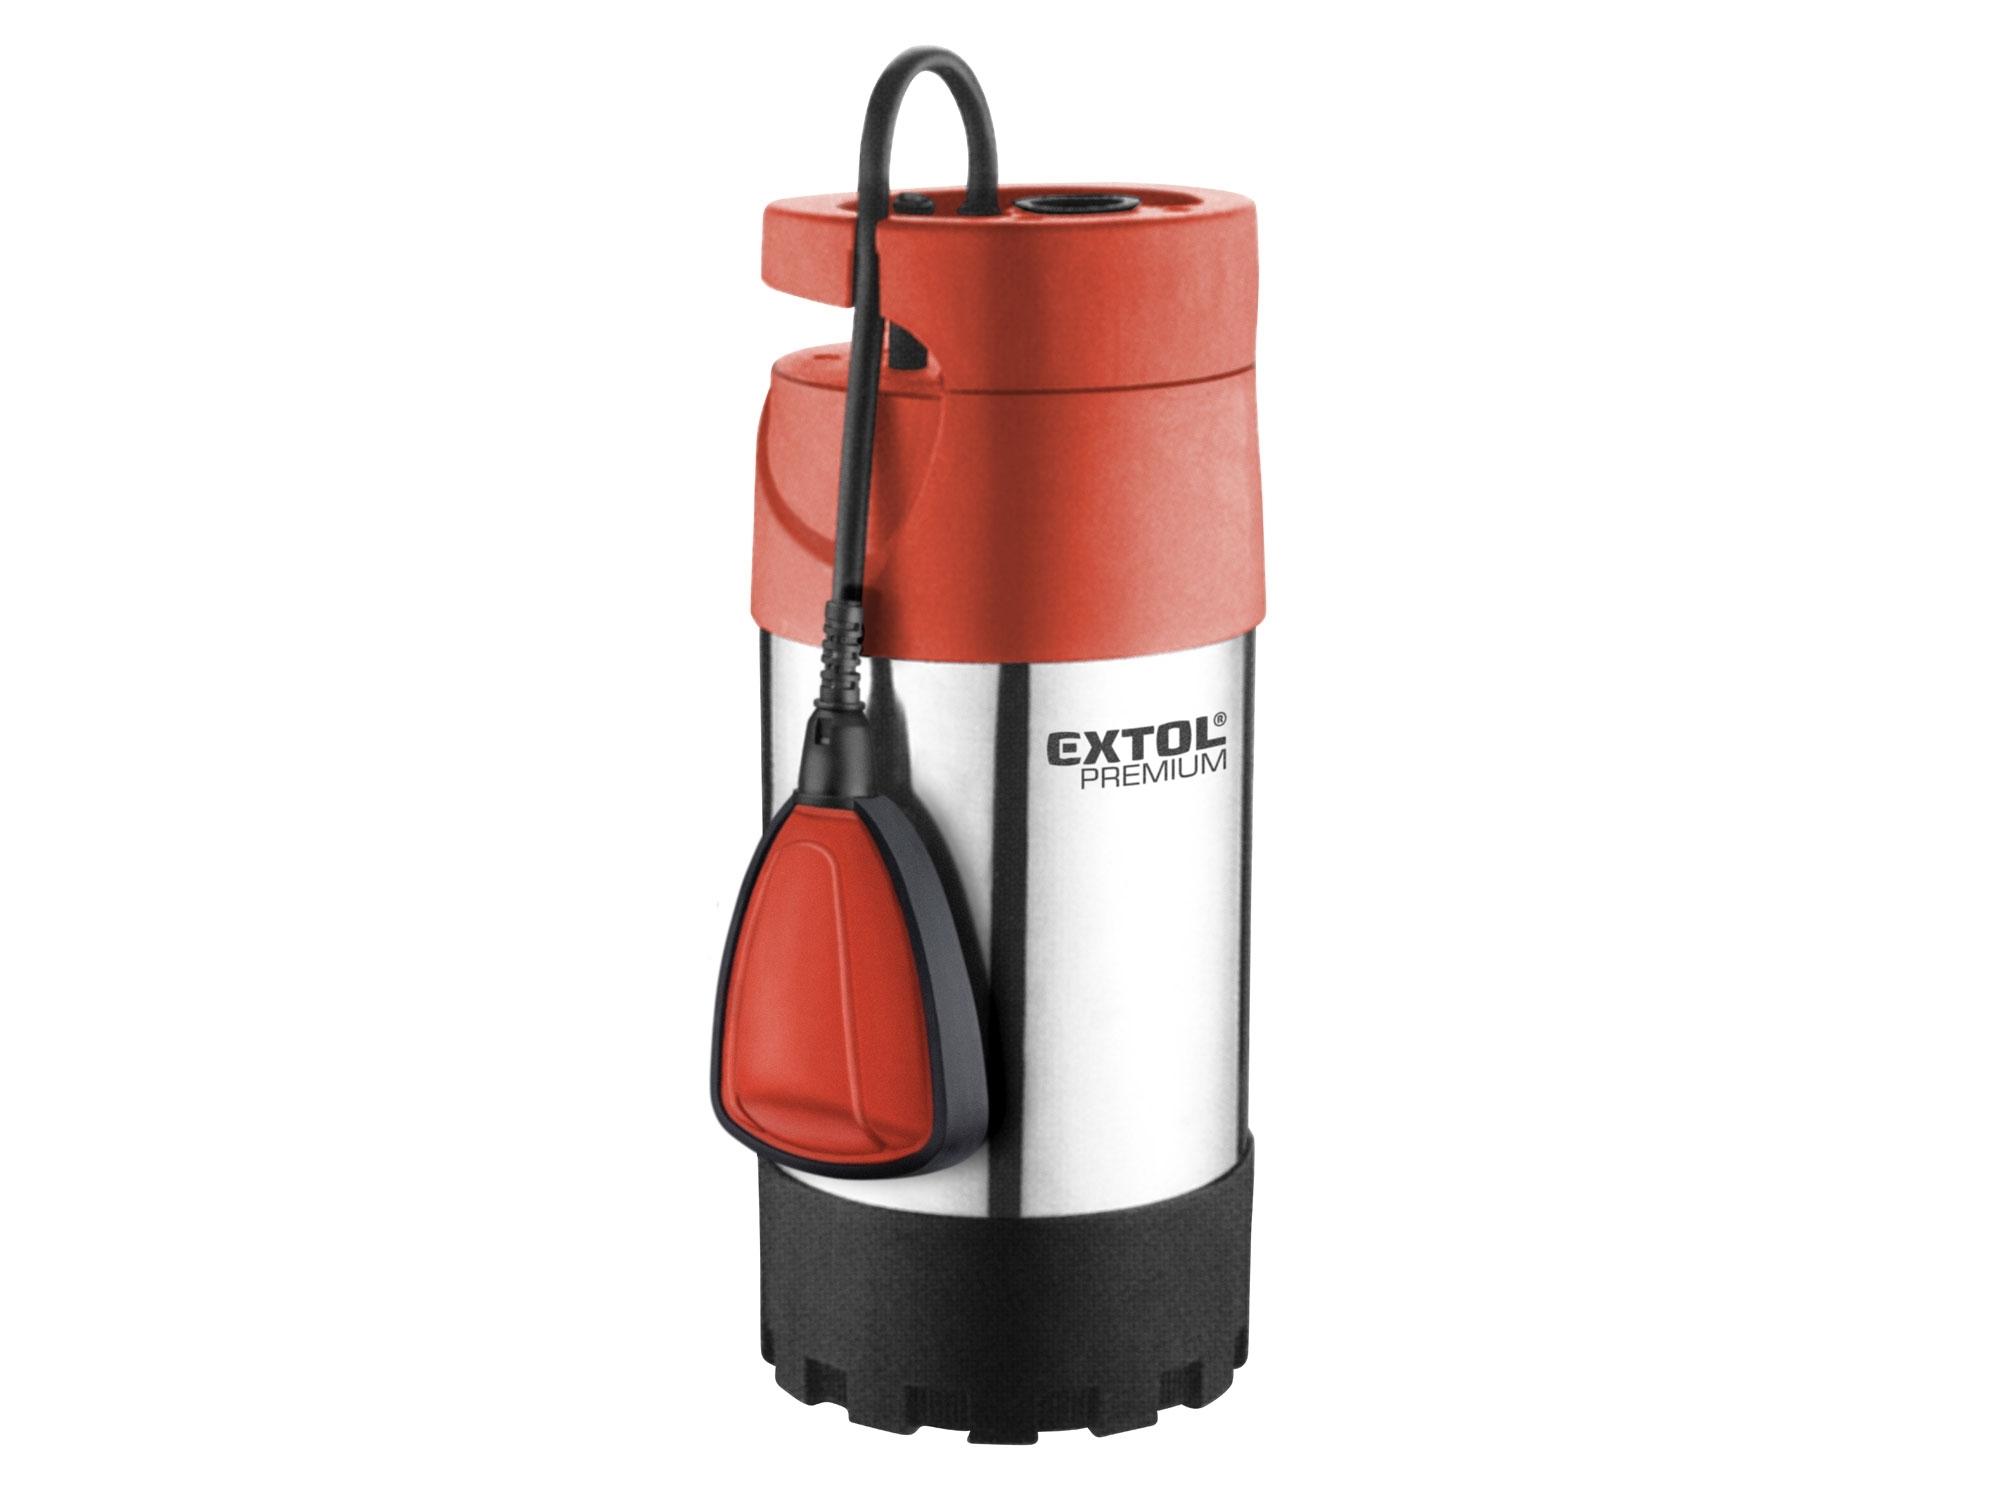 čerpadlo el. ponorné tlakové, 1000W, 5500l/hod, EXTOL PREMIUM, SPF 1000 G4 8895008